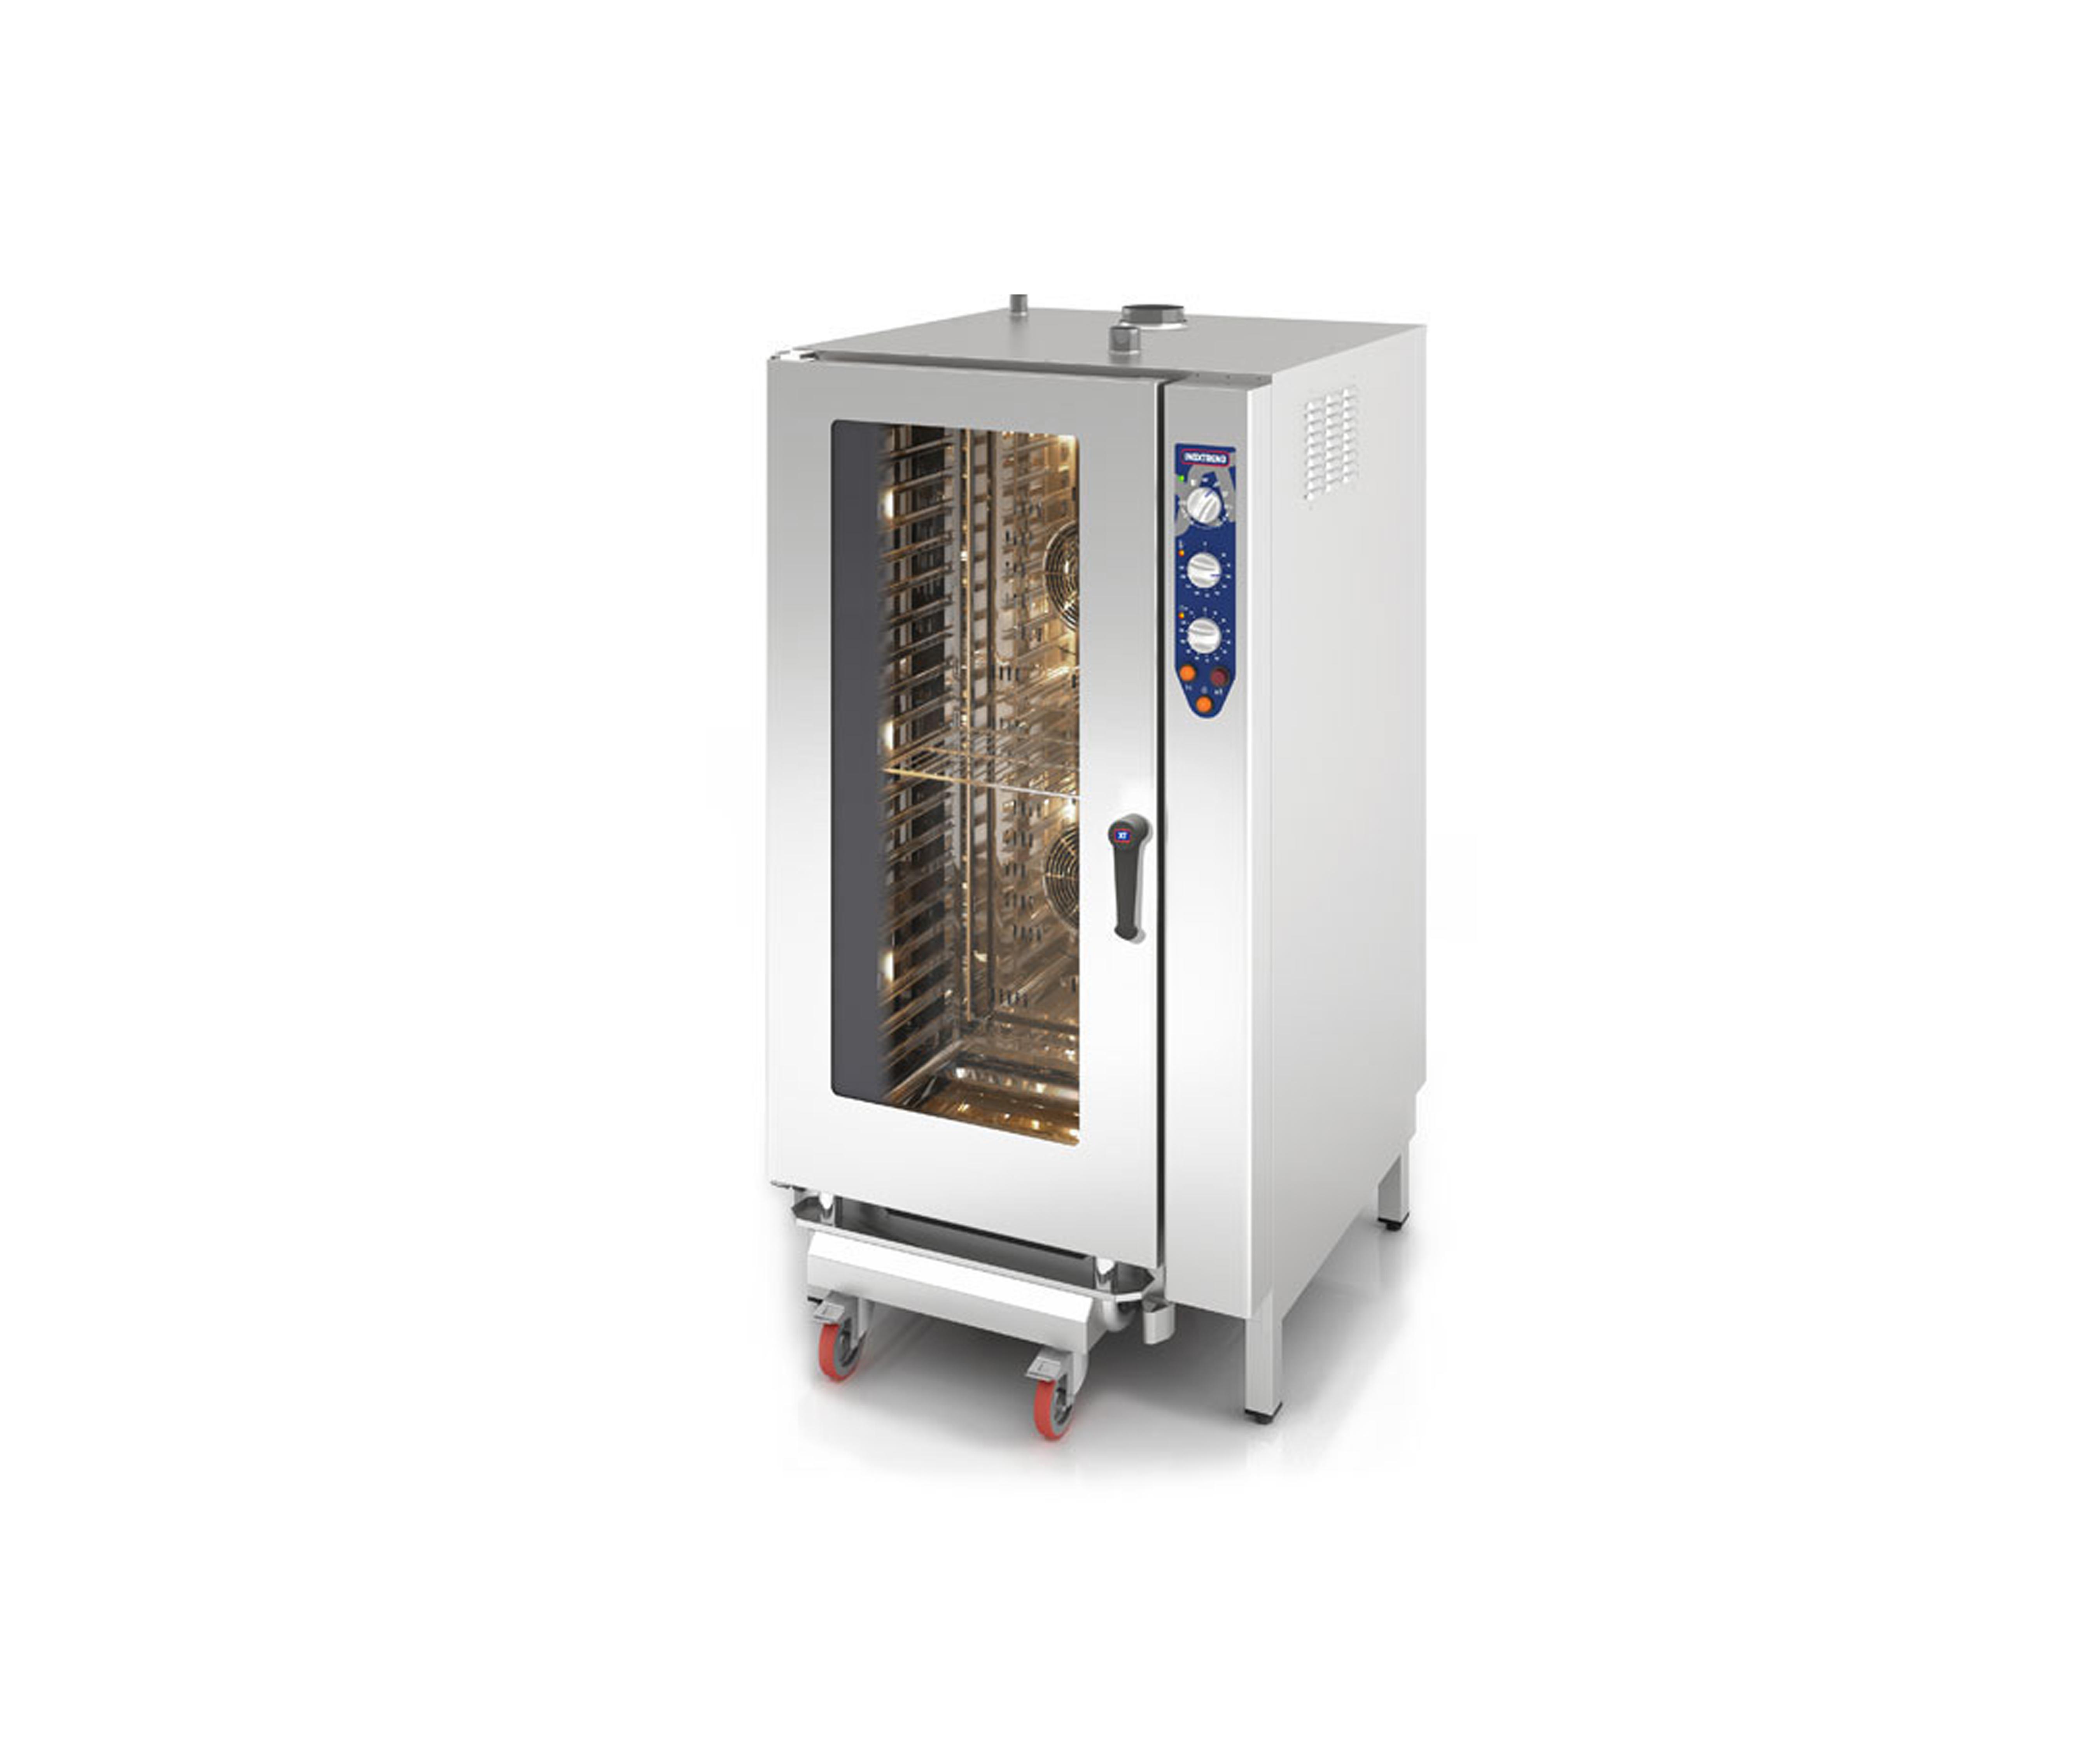 inoxtrend-xt-compact-cda-120g